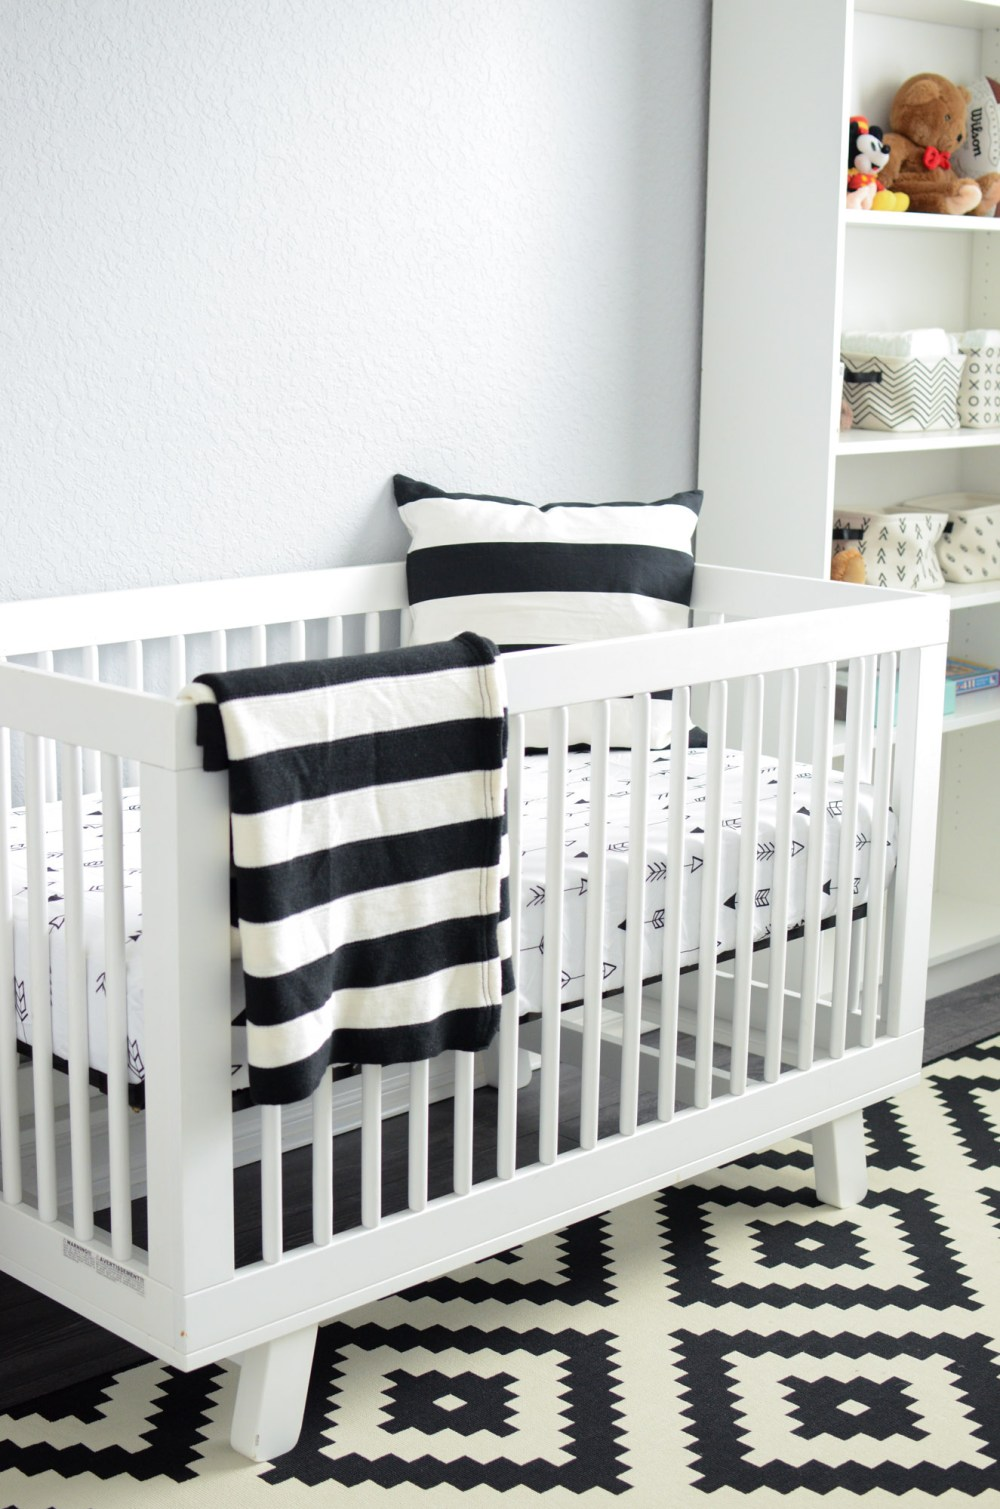 Babyletto Hudson Crib, Black and White nursery